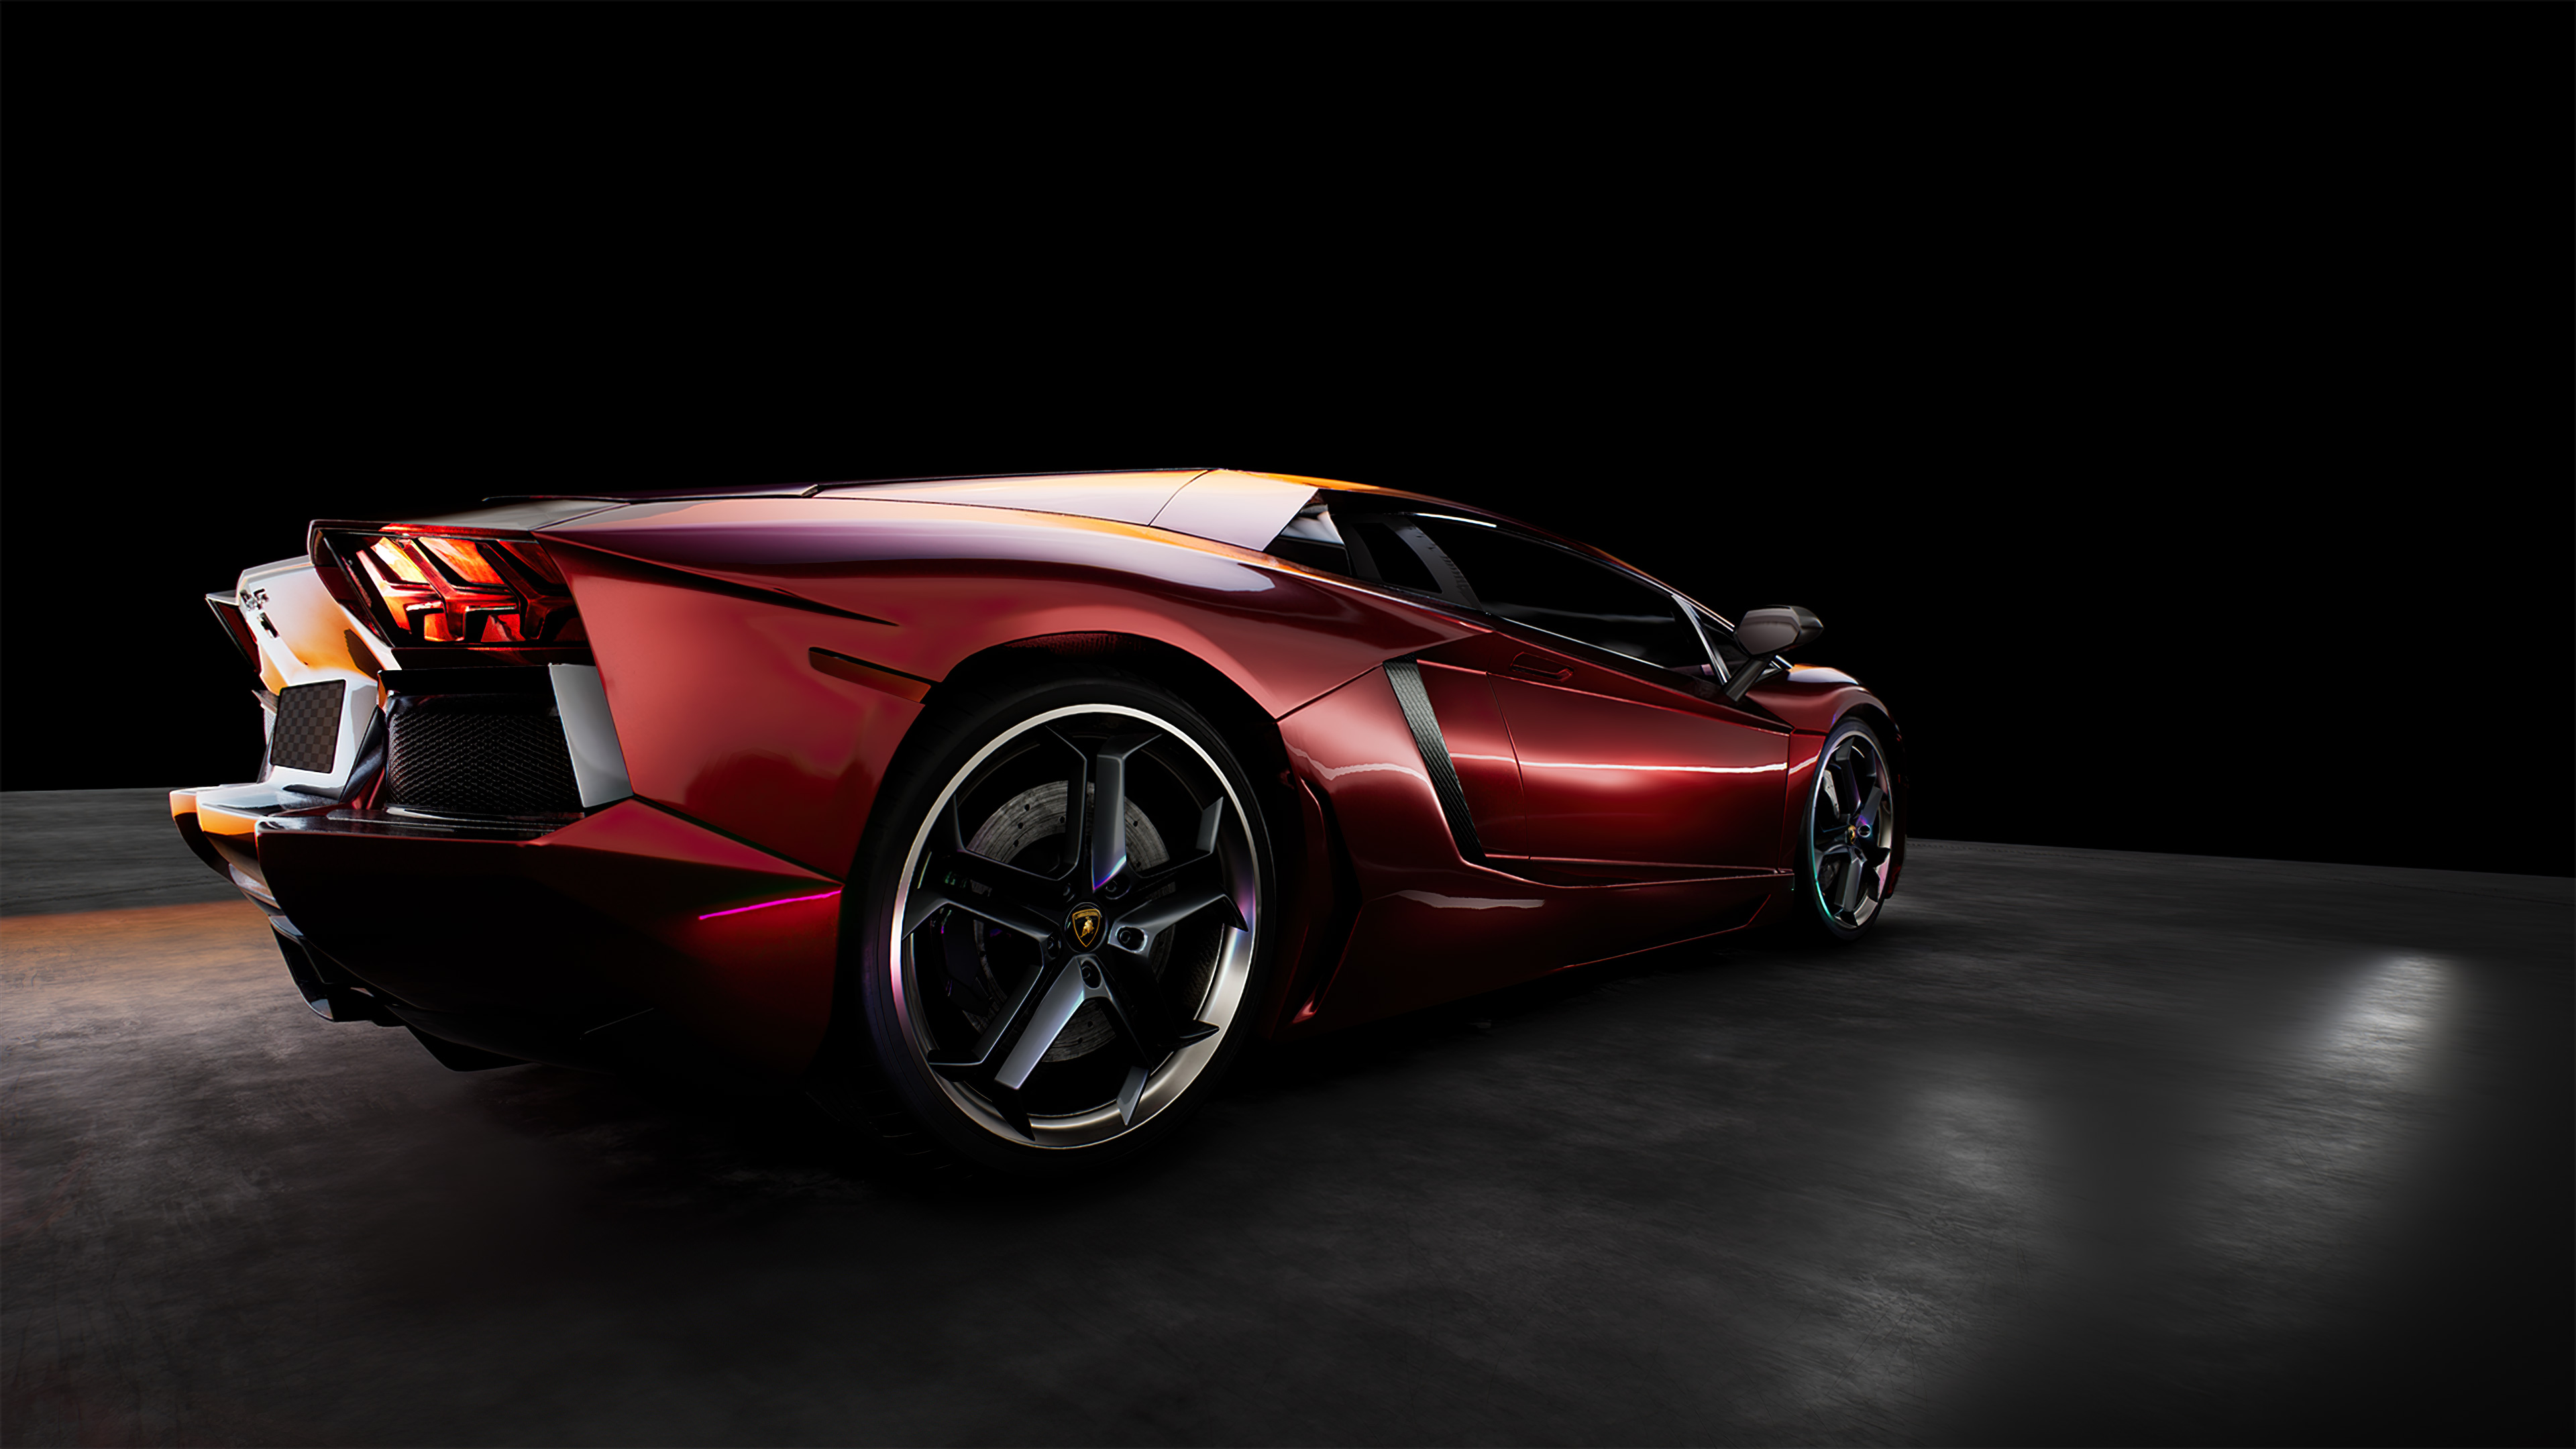 lamborghini aventador lp700 4 4k 1620170158 - Lamborghini Aventador LP700 4 4k - Lamborghini Aventador LP700 4 4k wallpapers